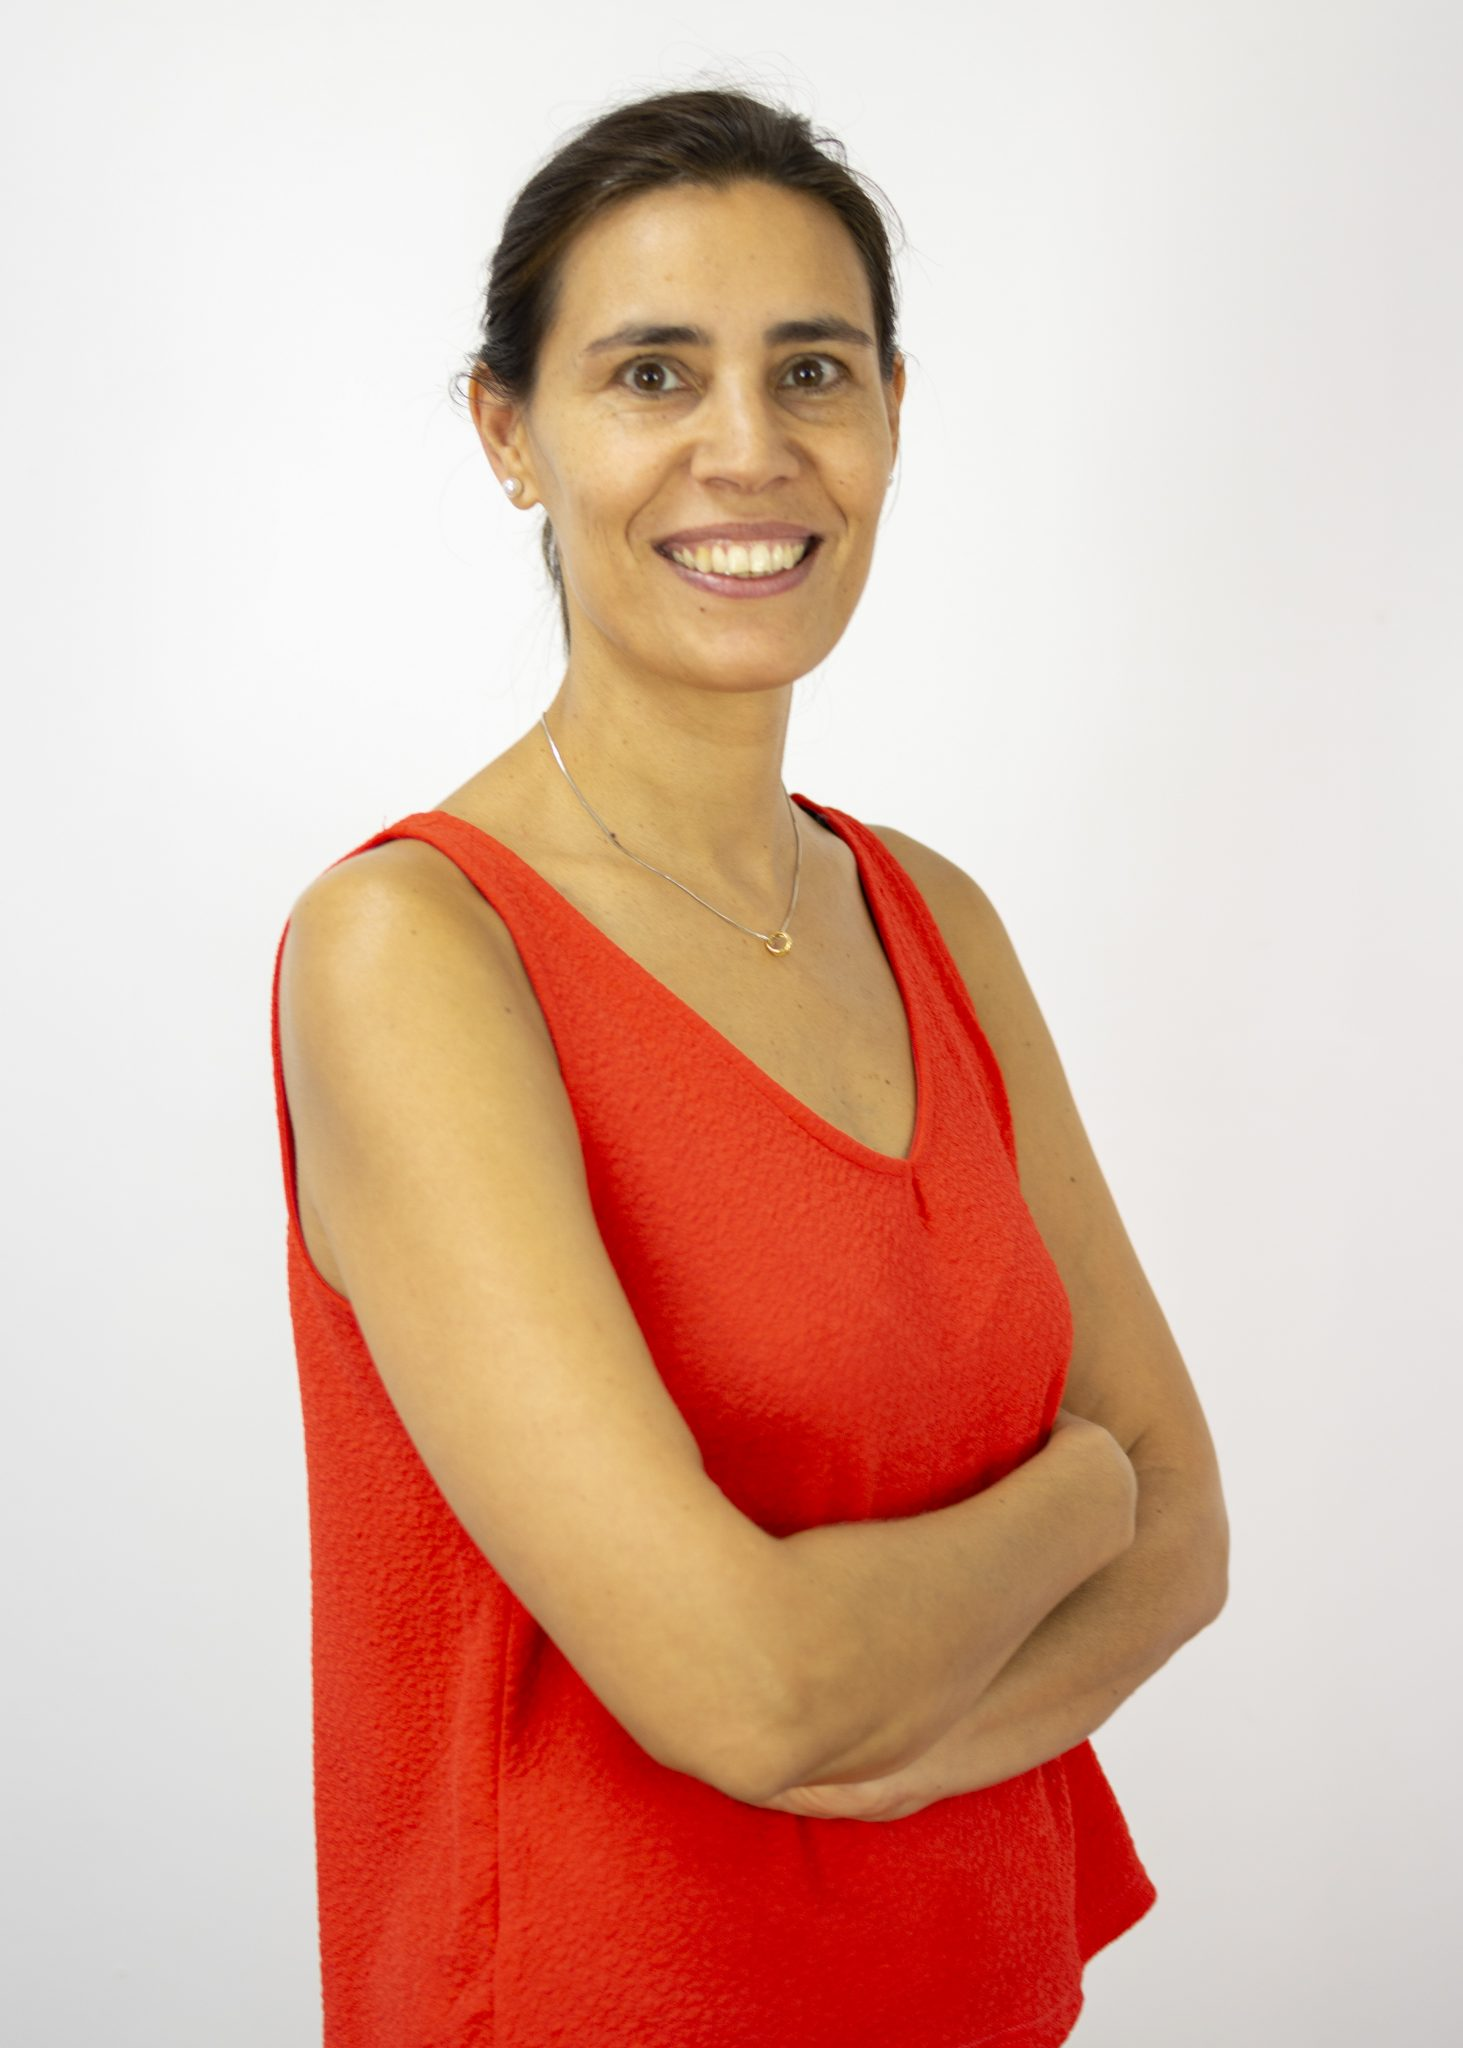 Veronica Dolader